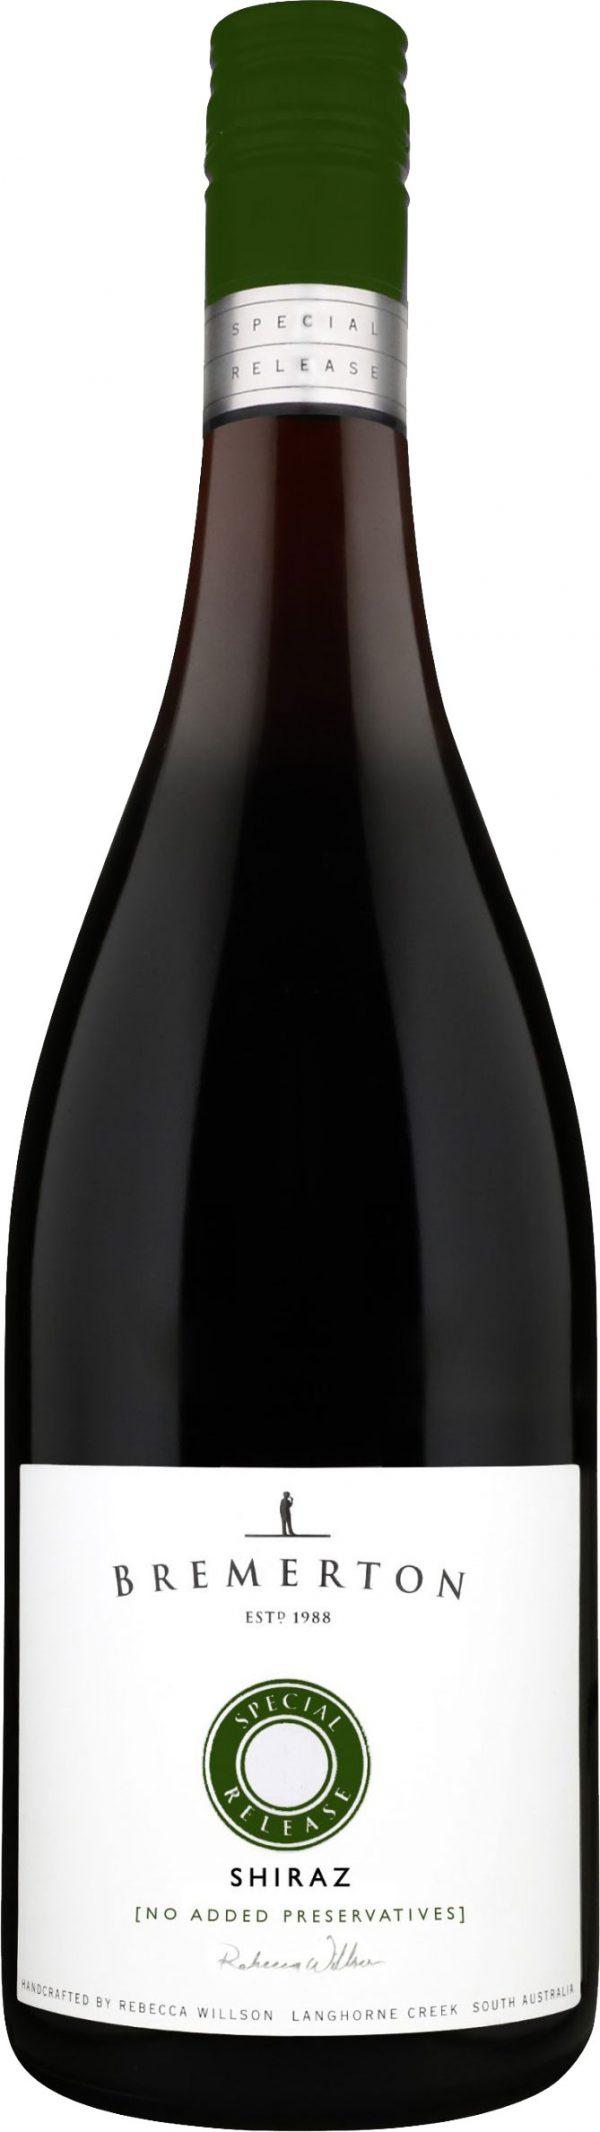 Bremerton - Preservative Free Shiraz 2019 75cl Bottle